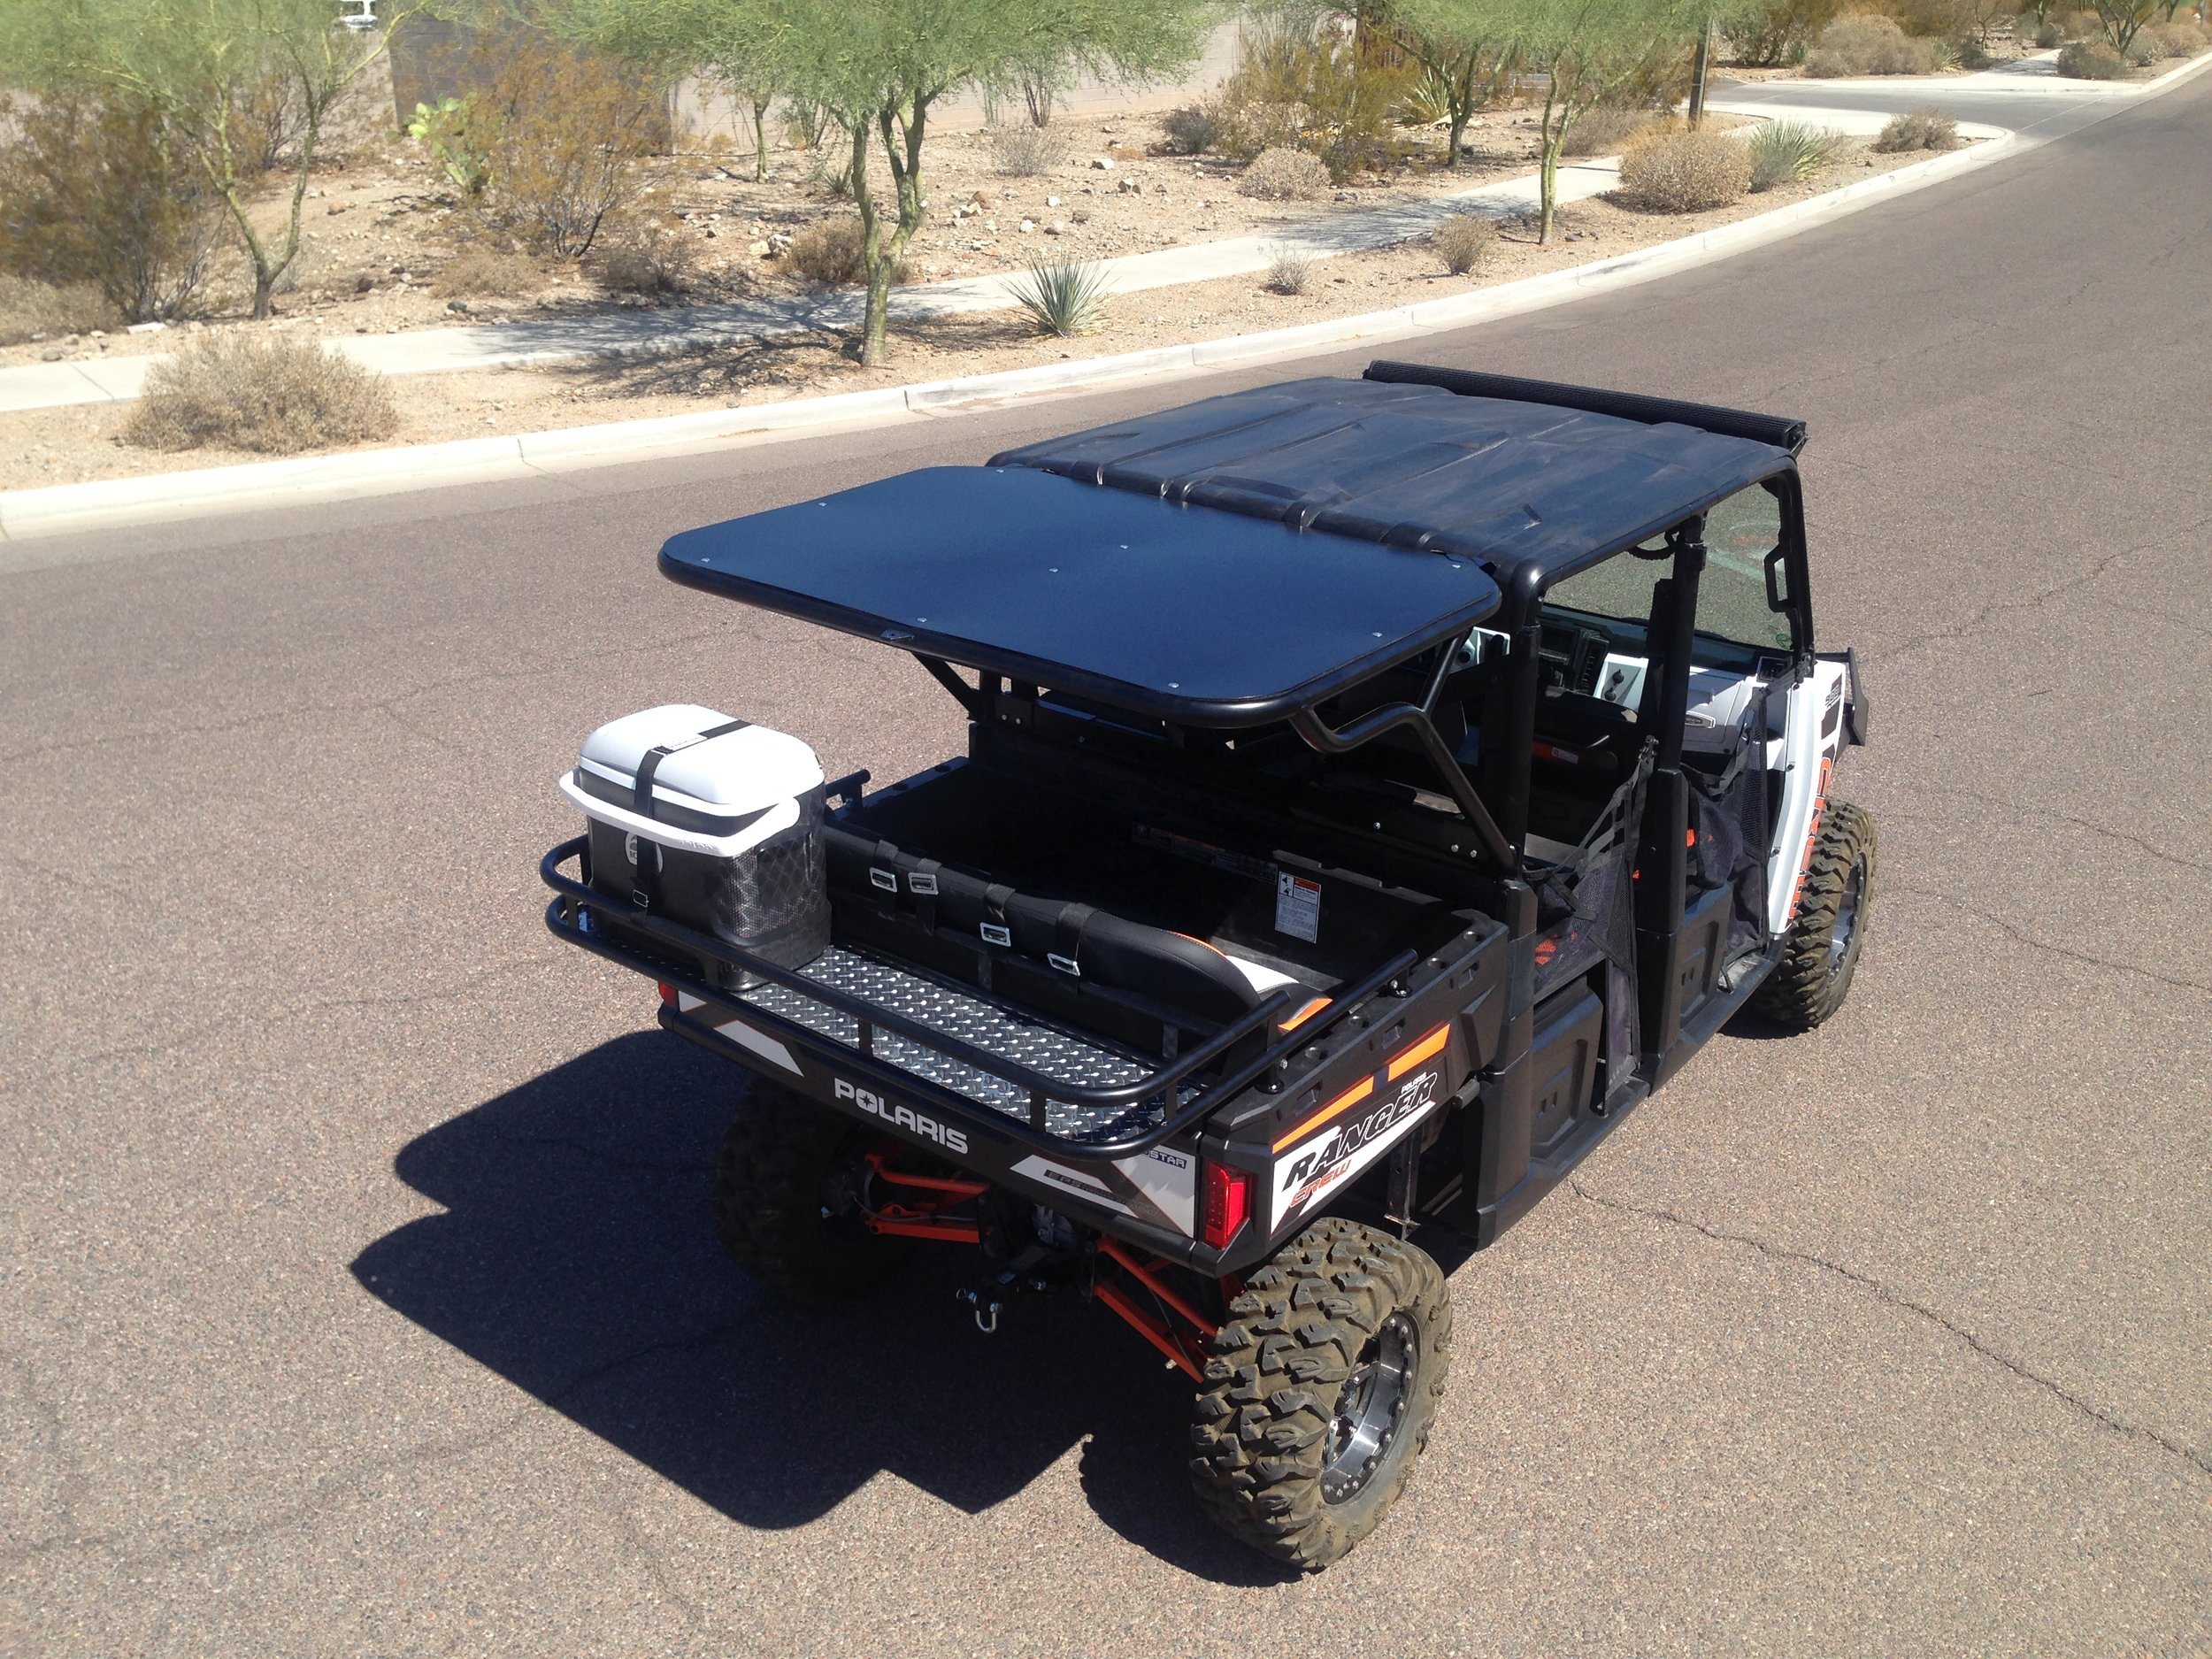 XP900 Ranger Crew accessories|Rear Cage|Cooler Rack|Metal Rood